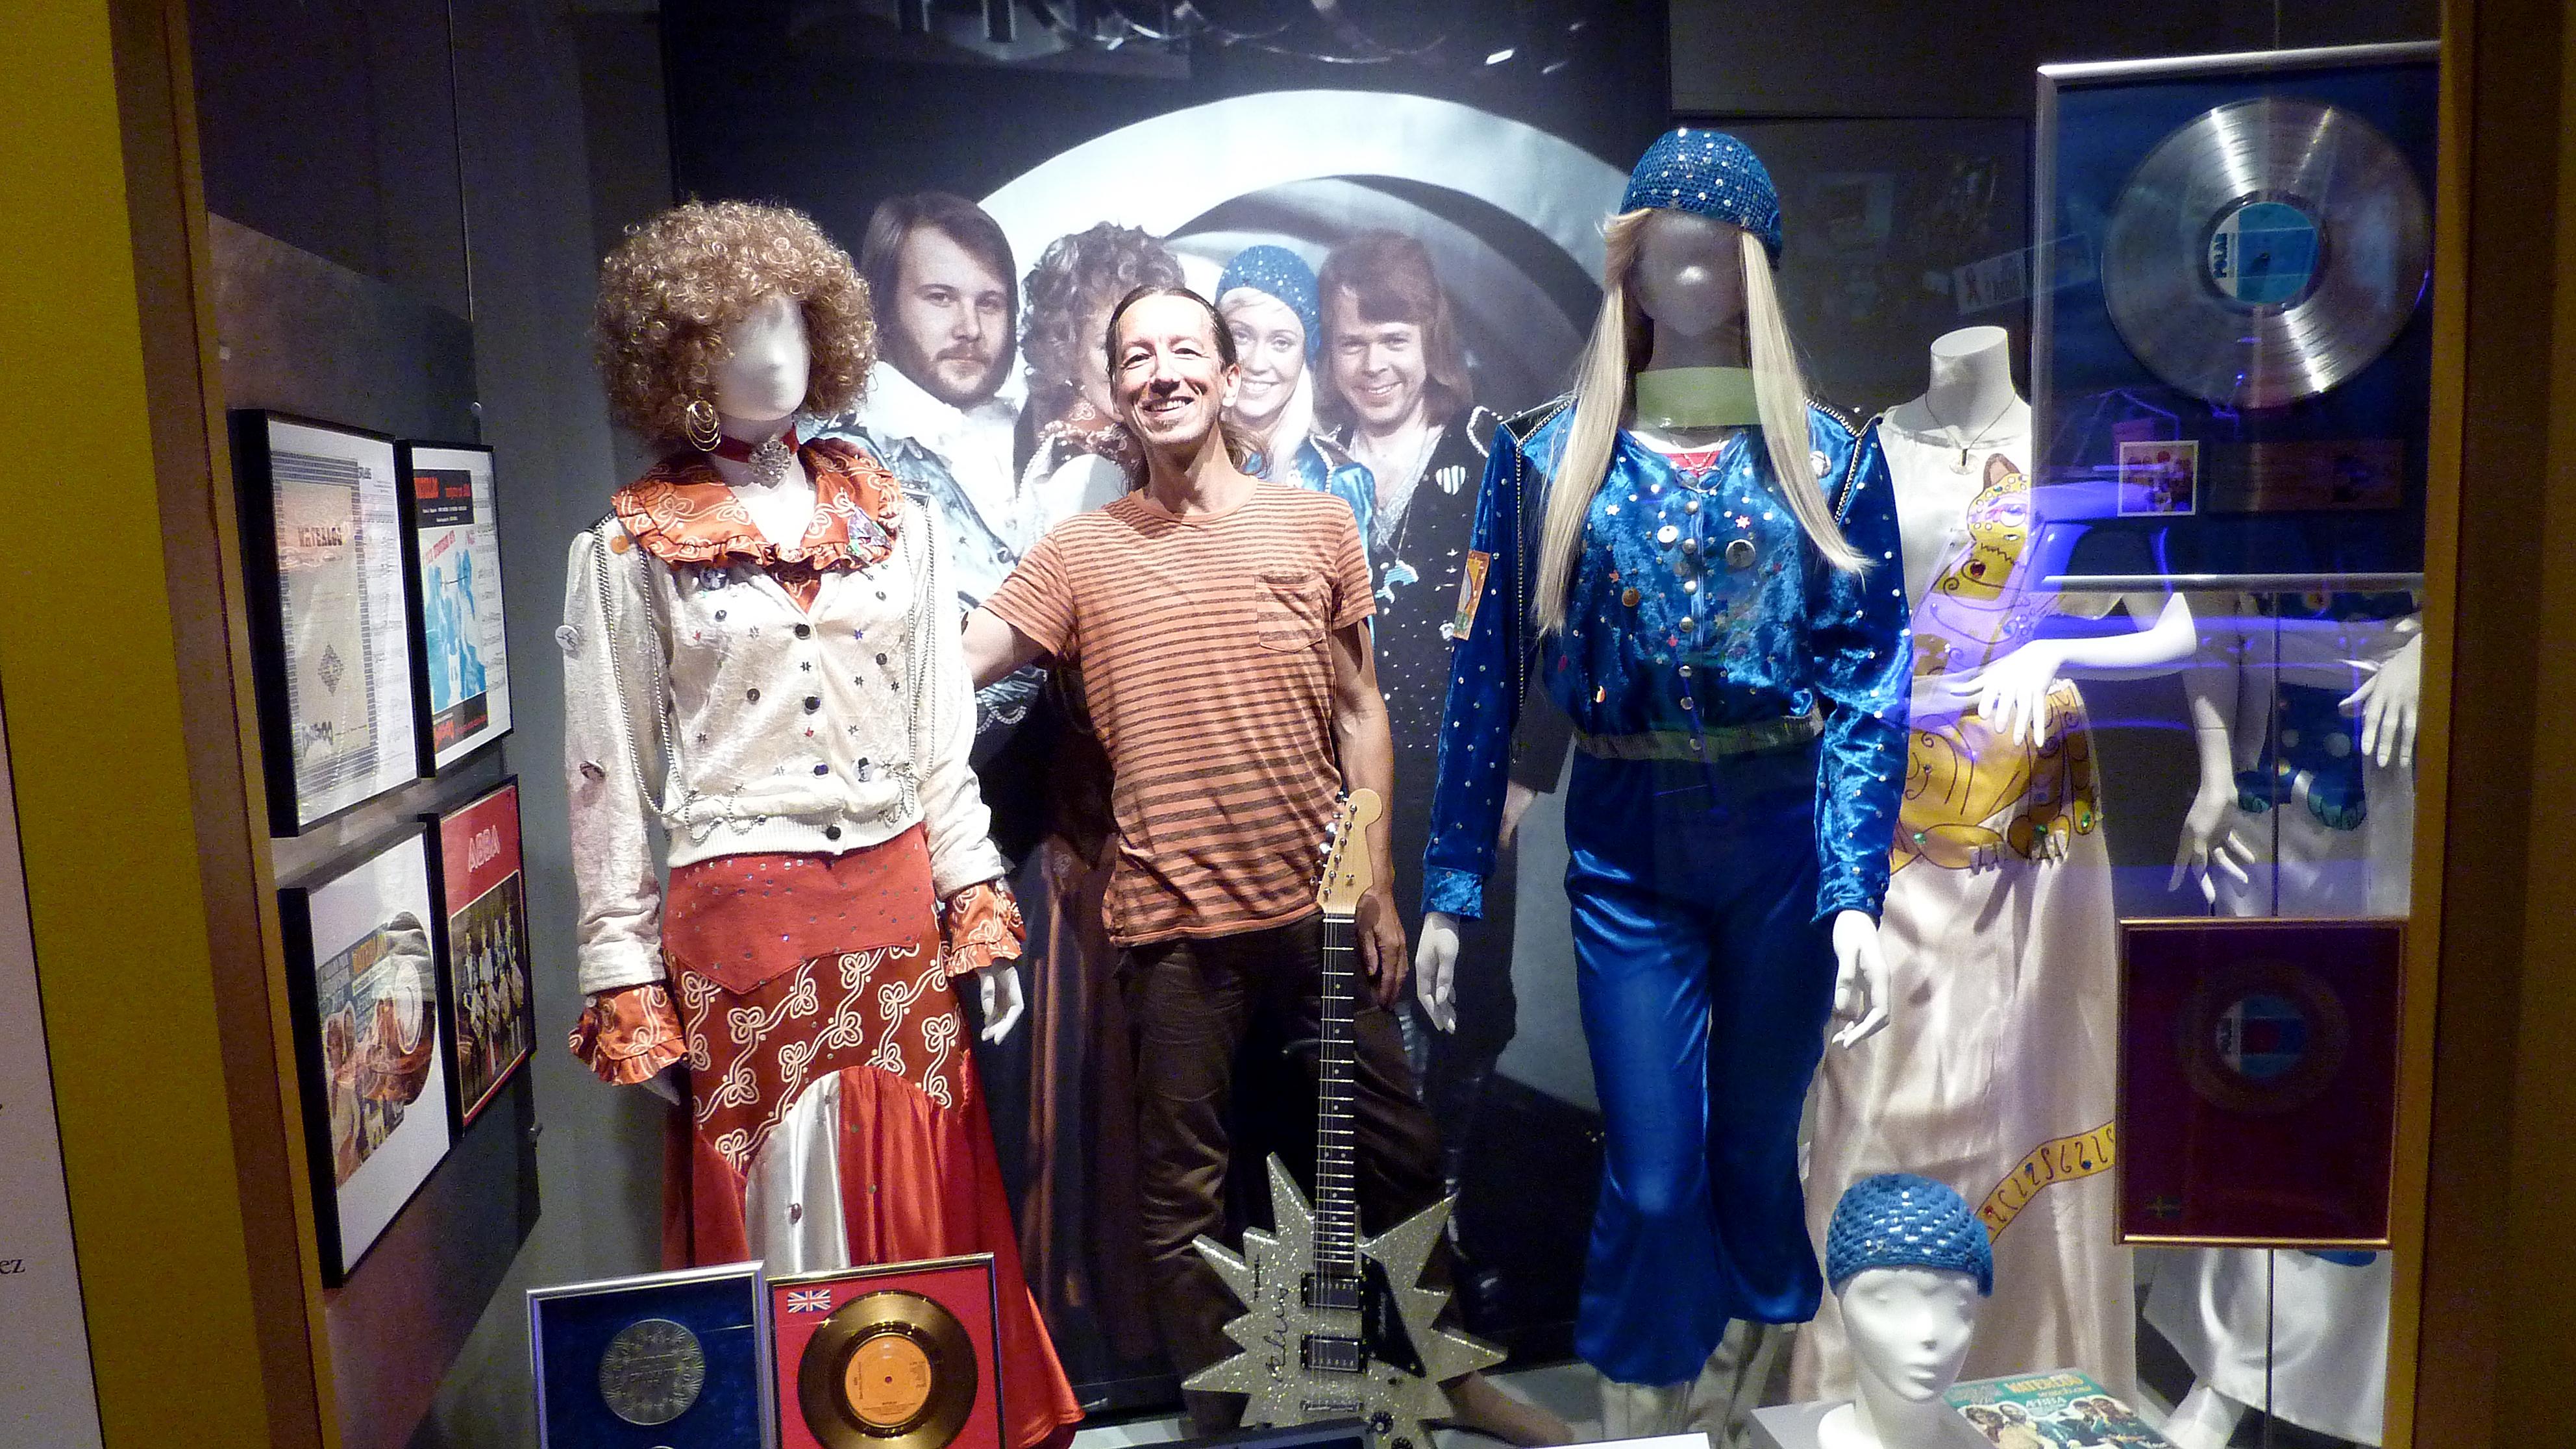 The Waterloo Showcase at MuPop Museum